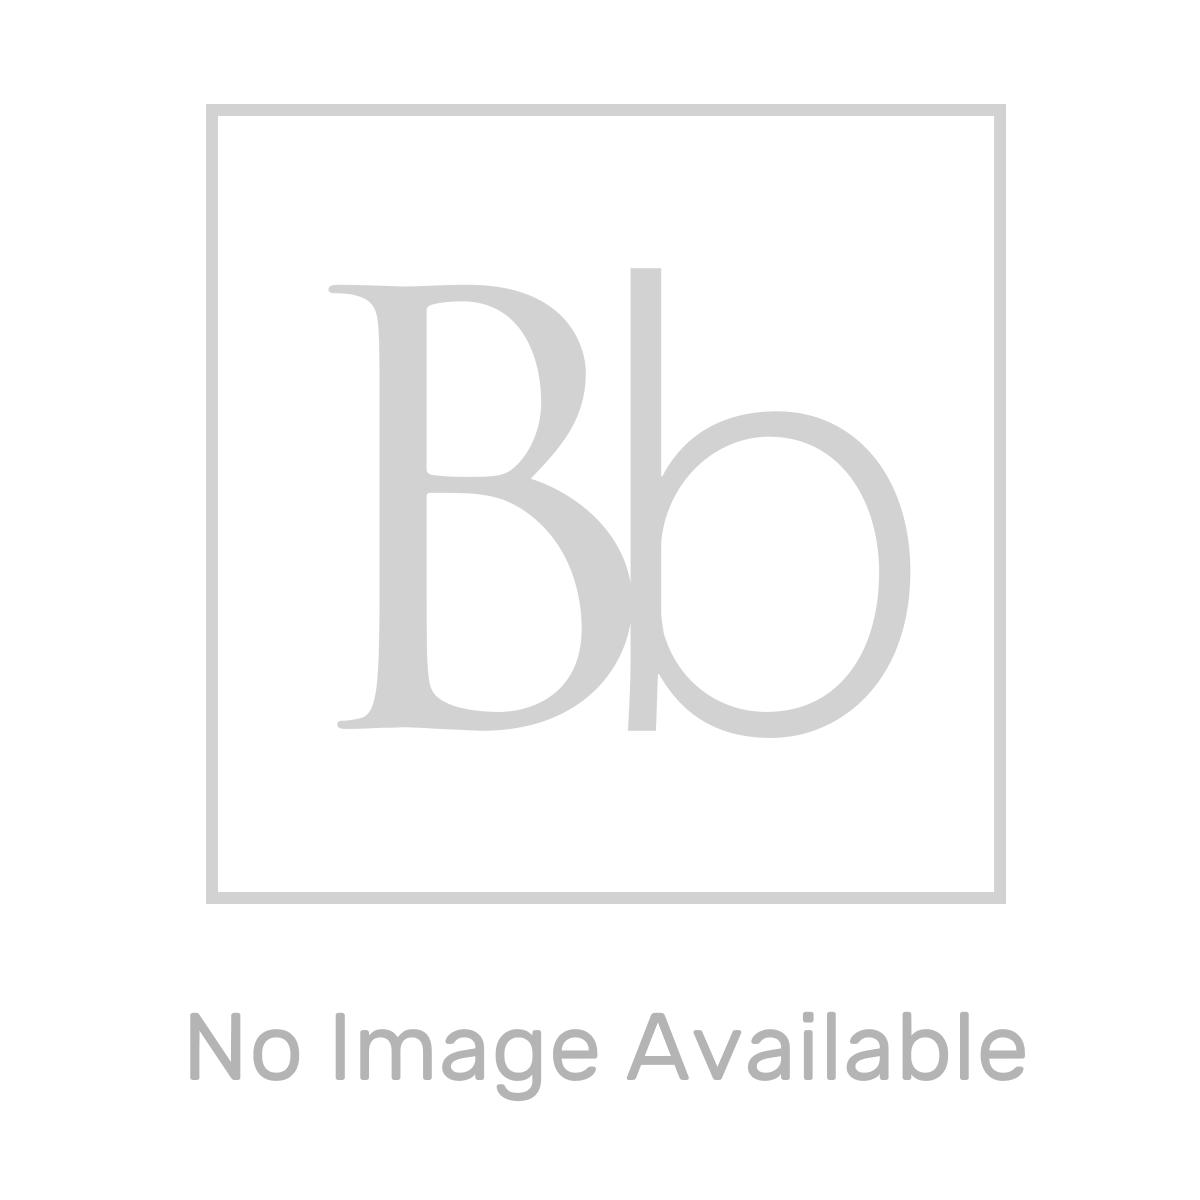 Aquadart Grey Slate Shower Tray 1400 x 700 Lifestyle